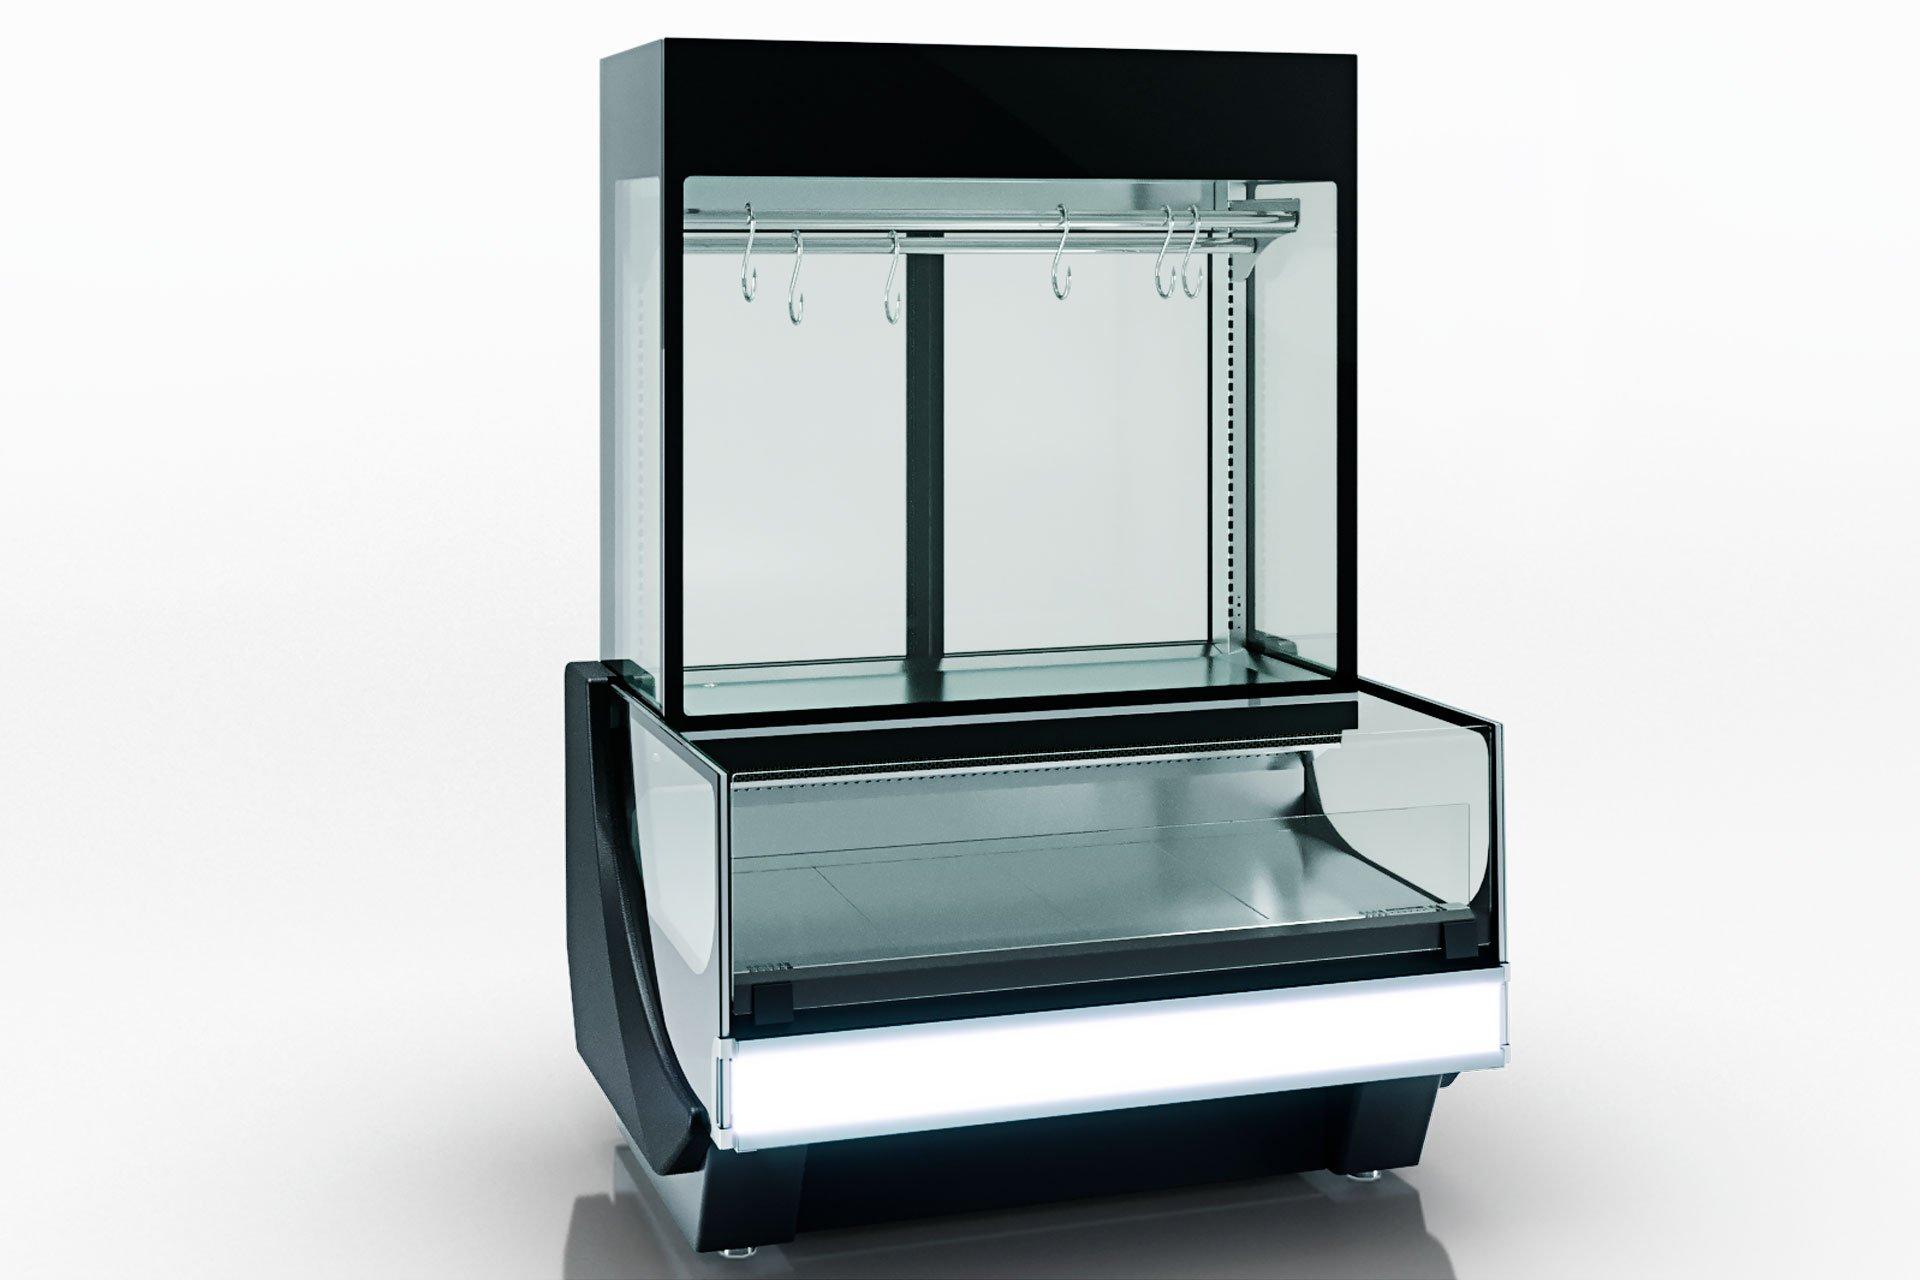 מקרר ויטרינה MISSOURI COLD DIAMOND MC 115 CRYSTAL COMBI S M/A